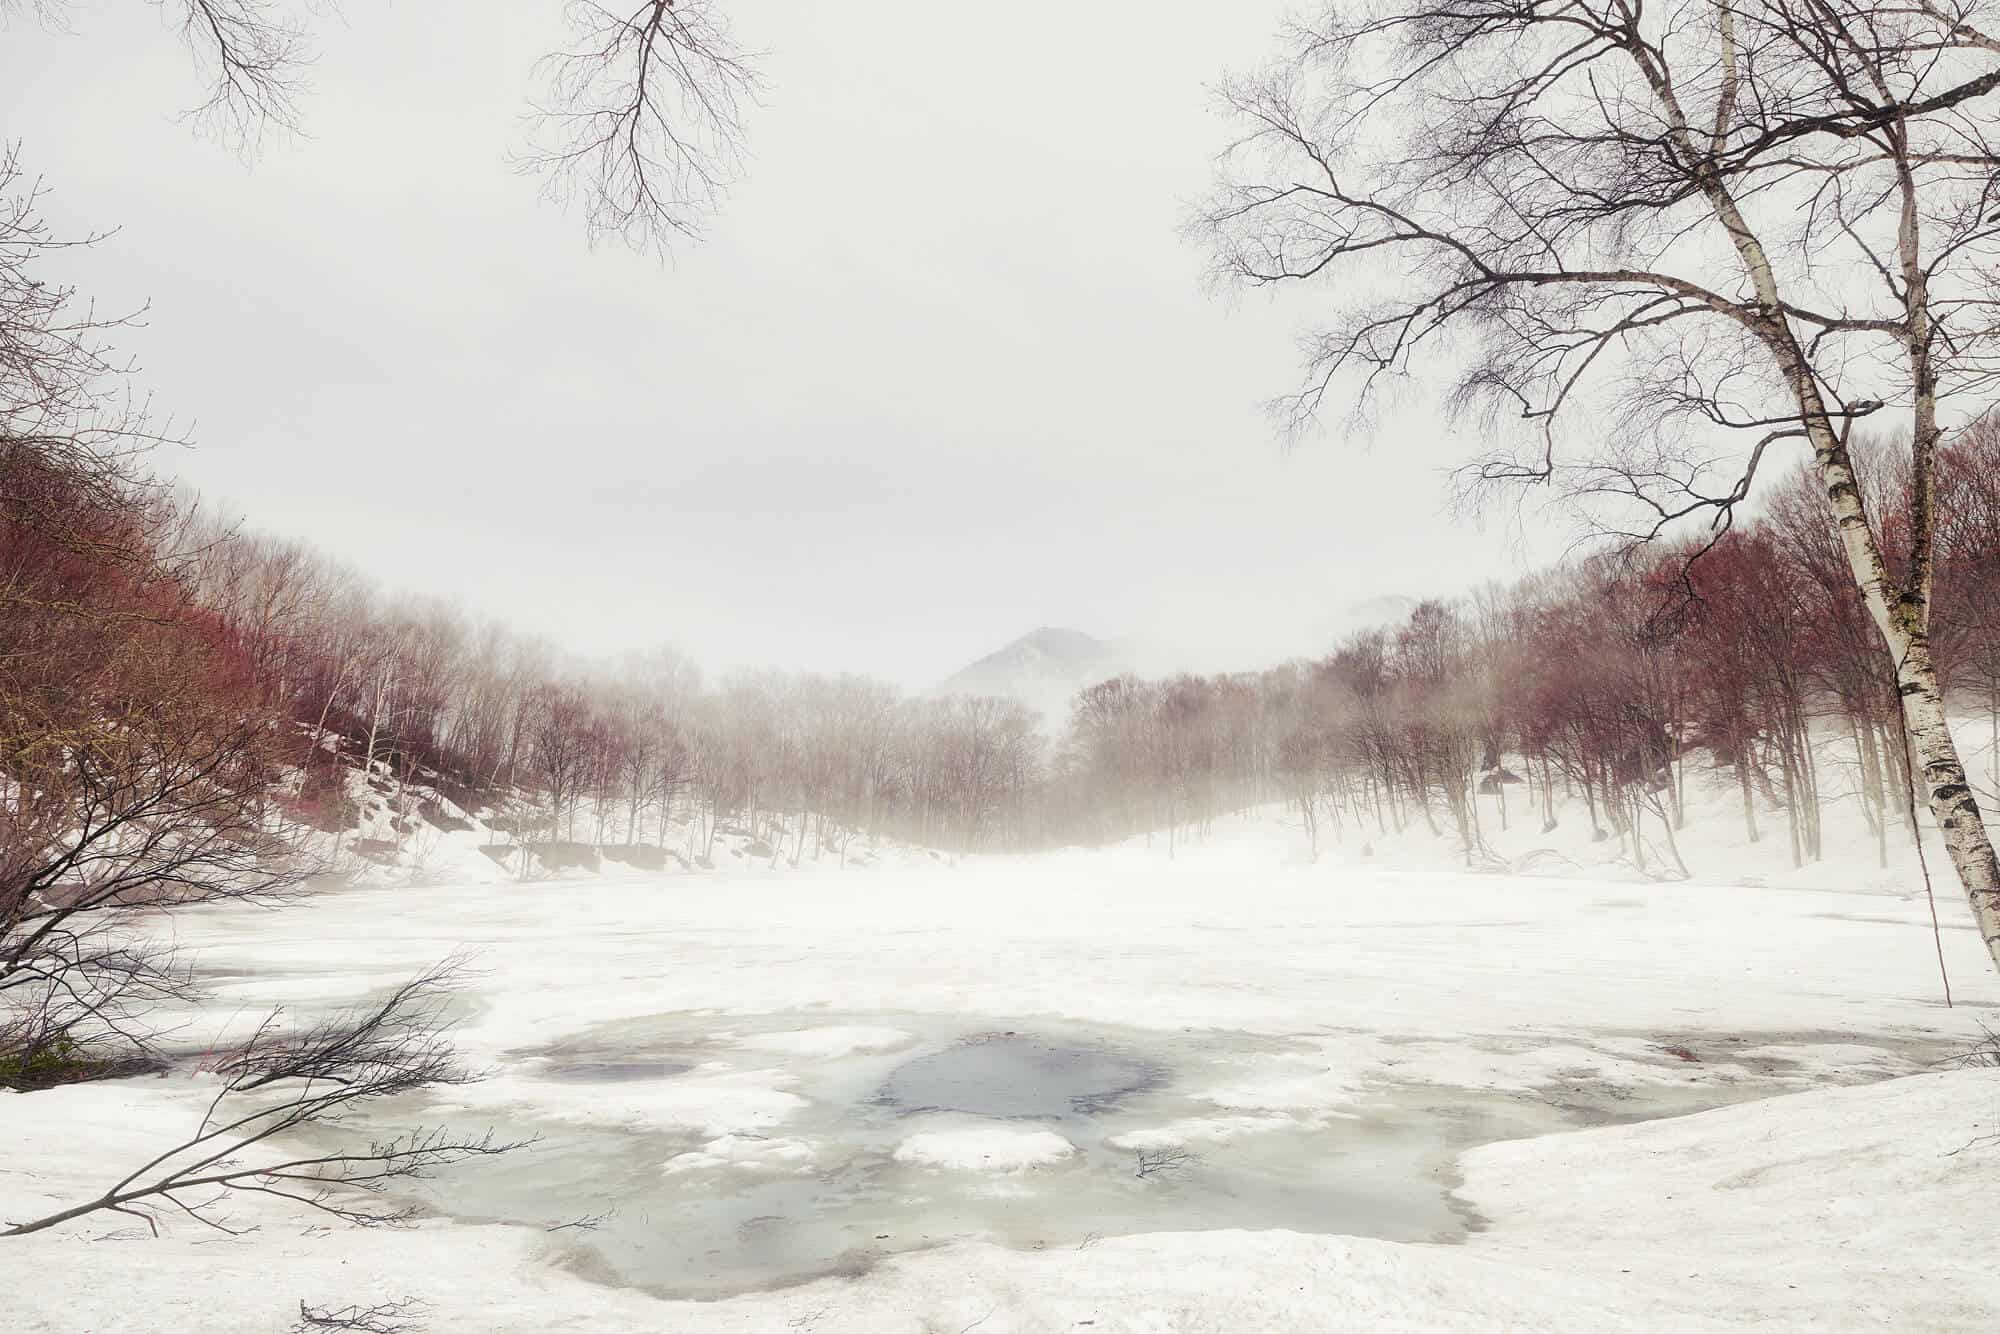 Sasagamine Snowshoe